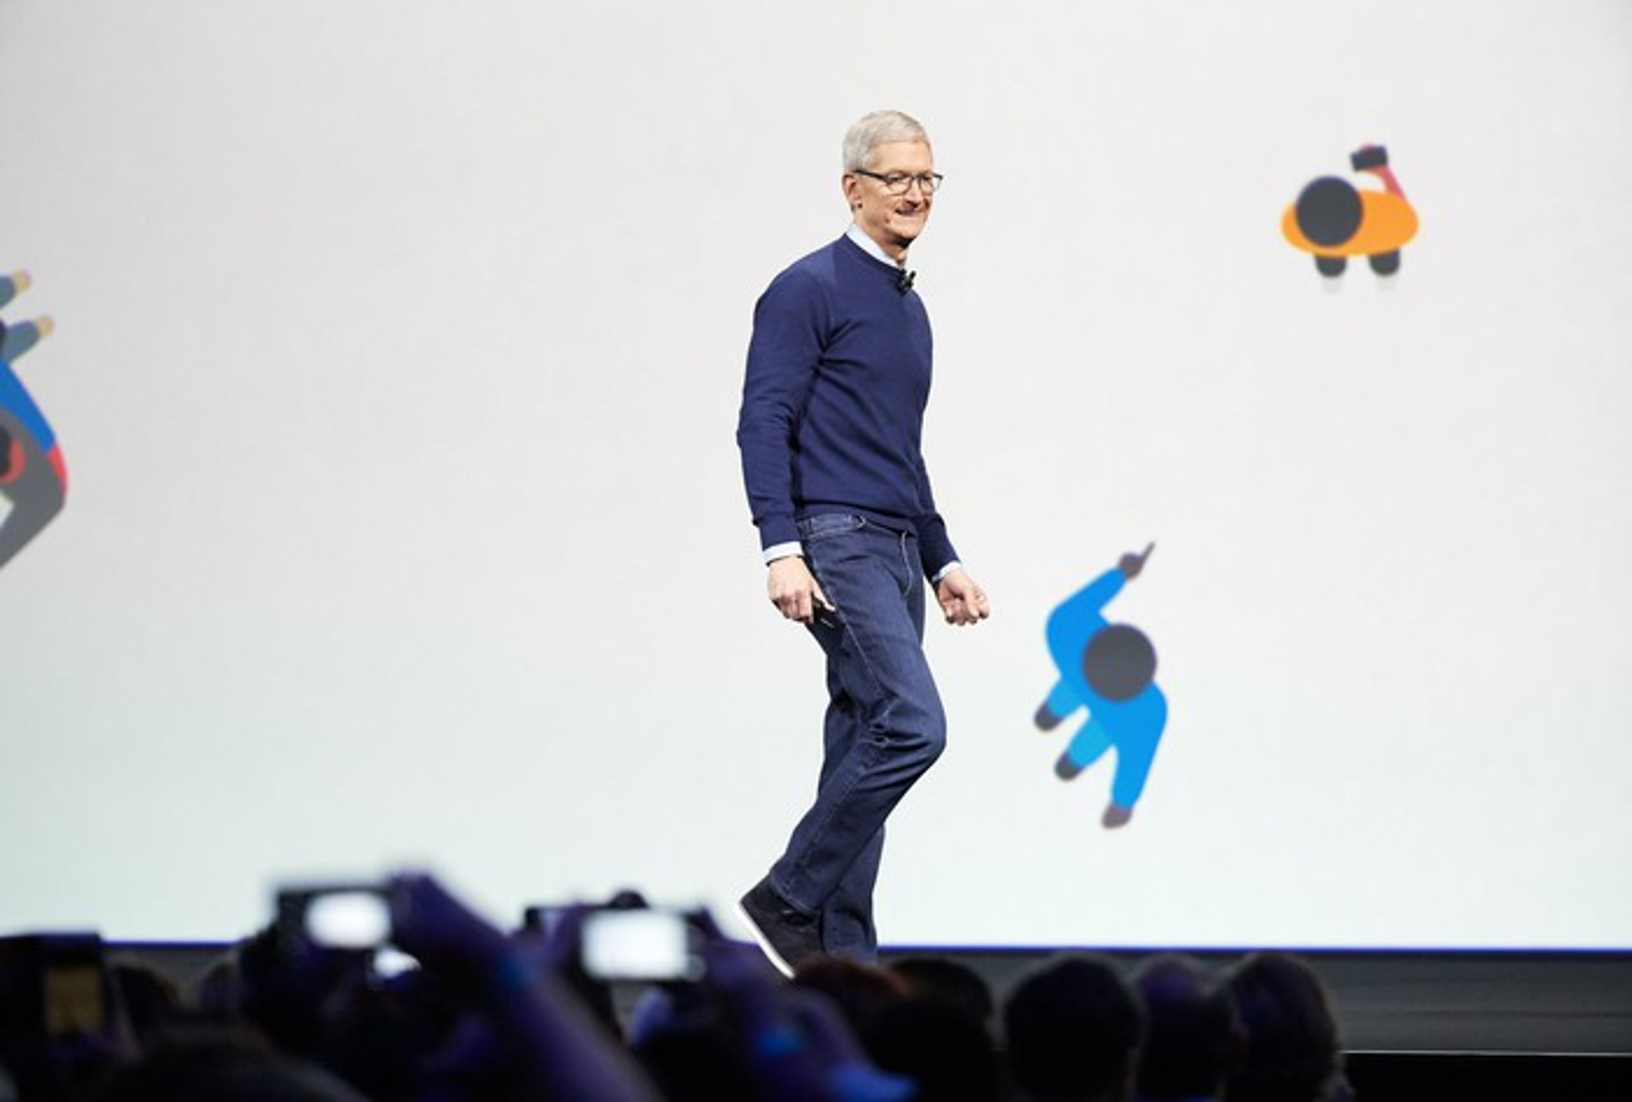 Apple CEO Tim Cook speaking onstage at WWDC 2017.